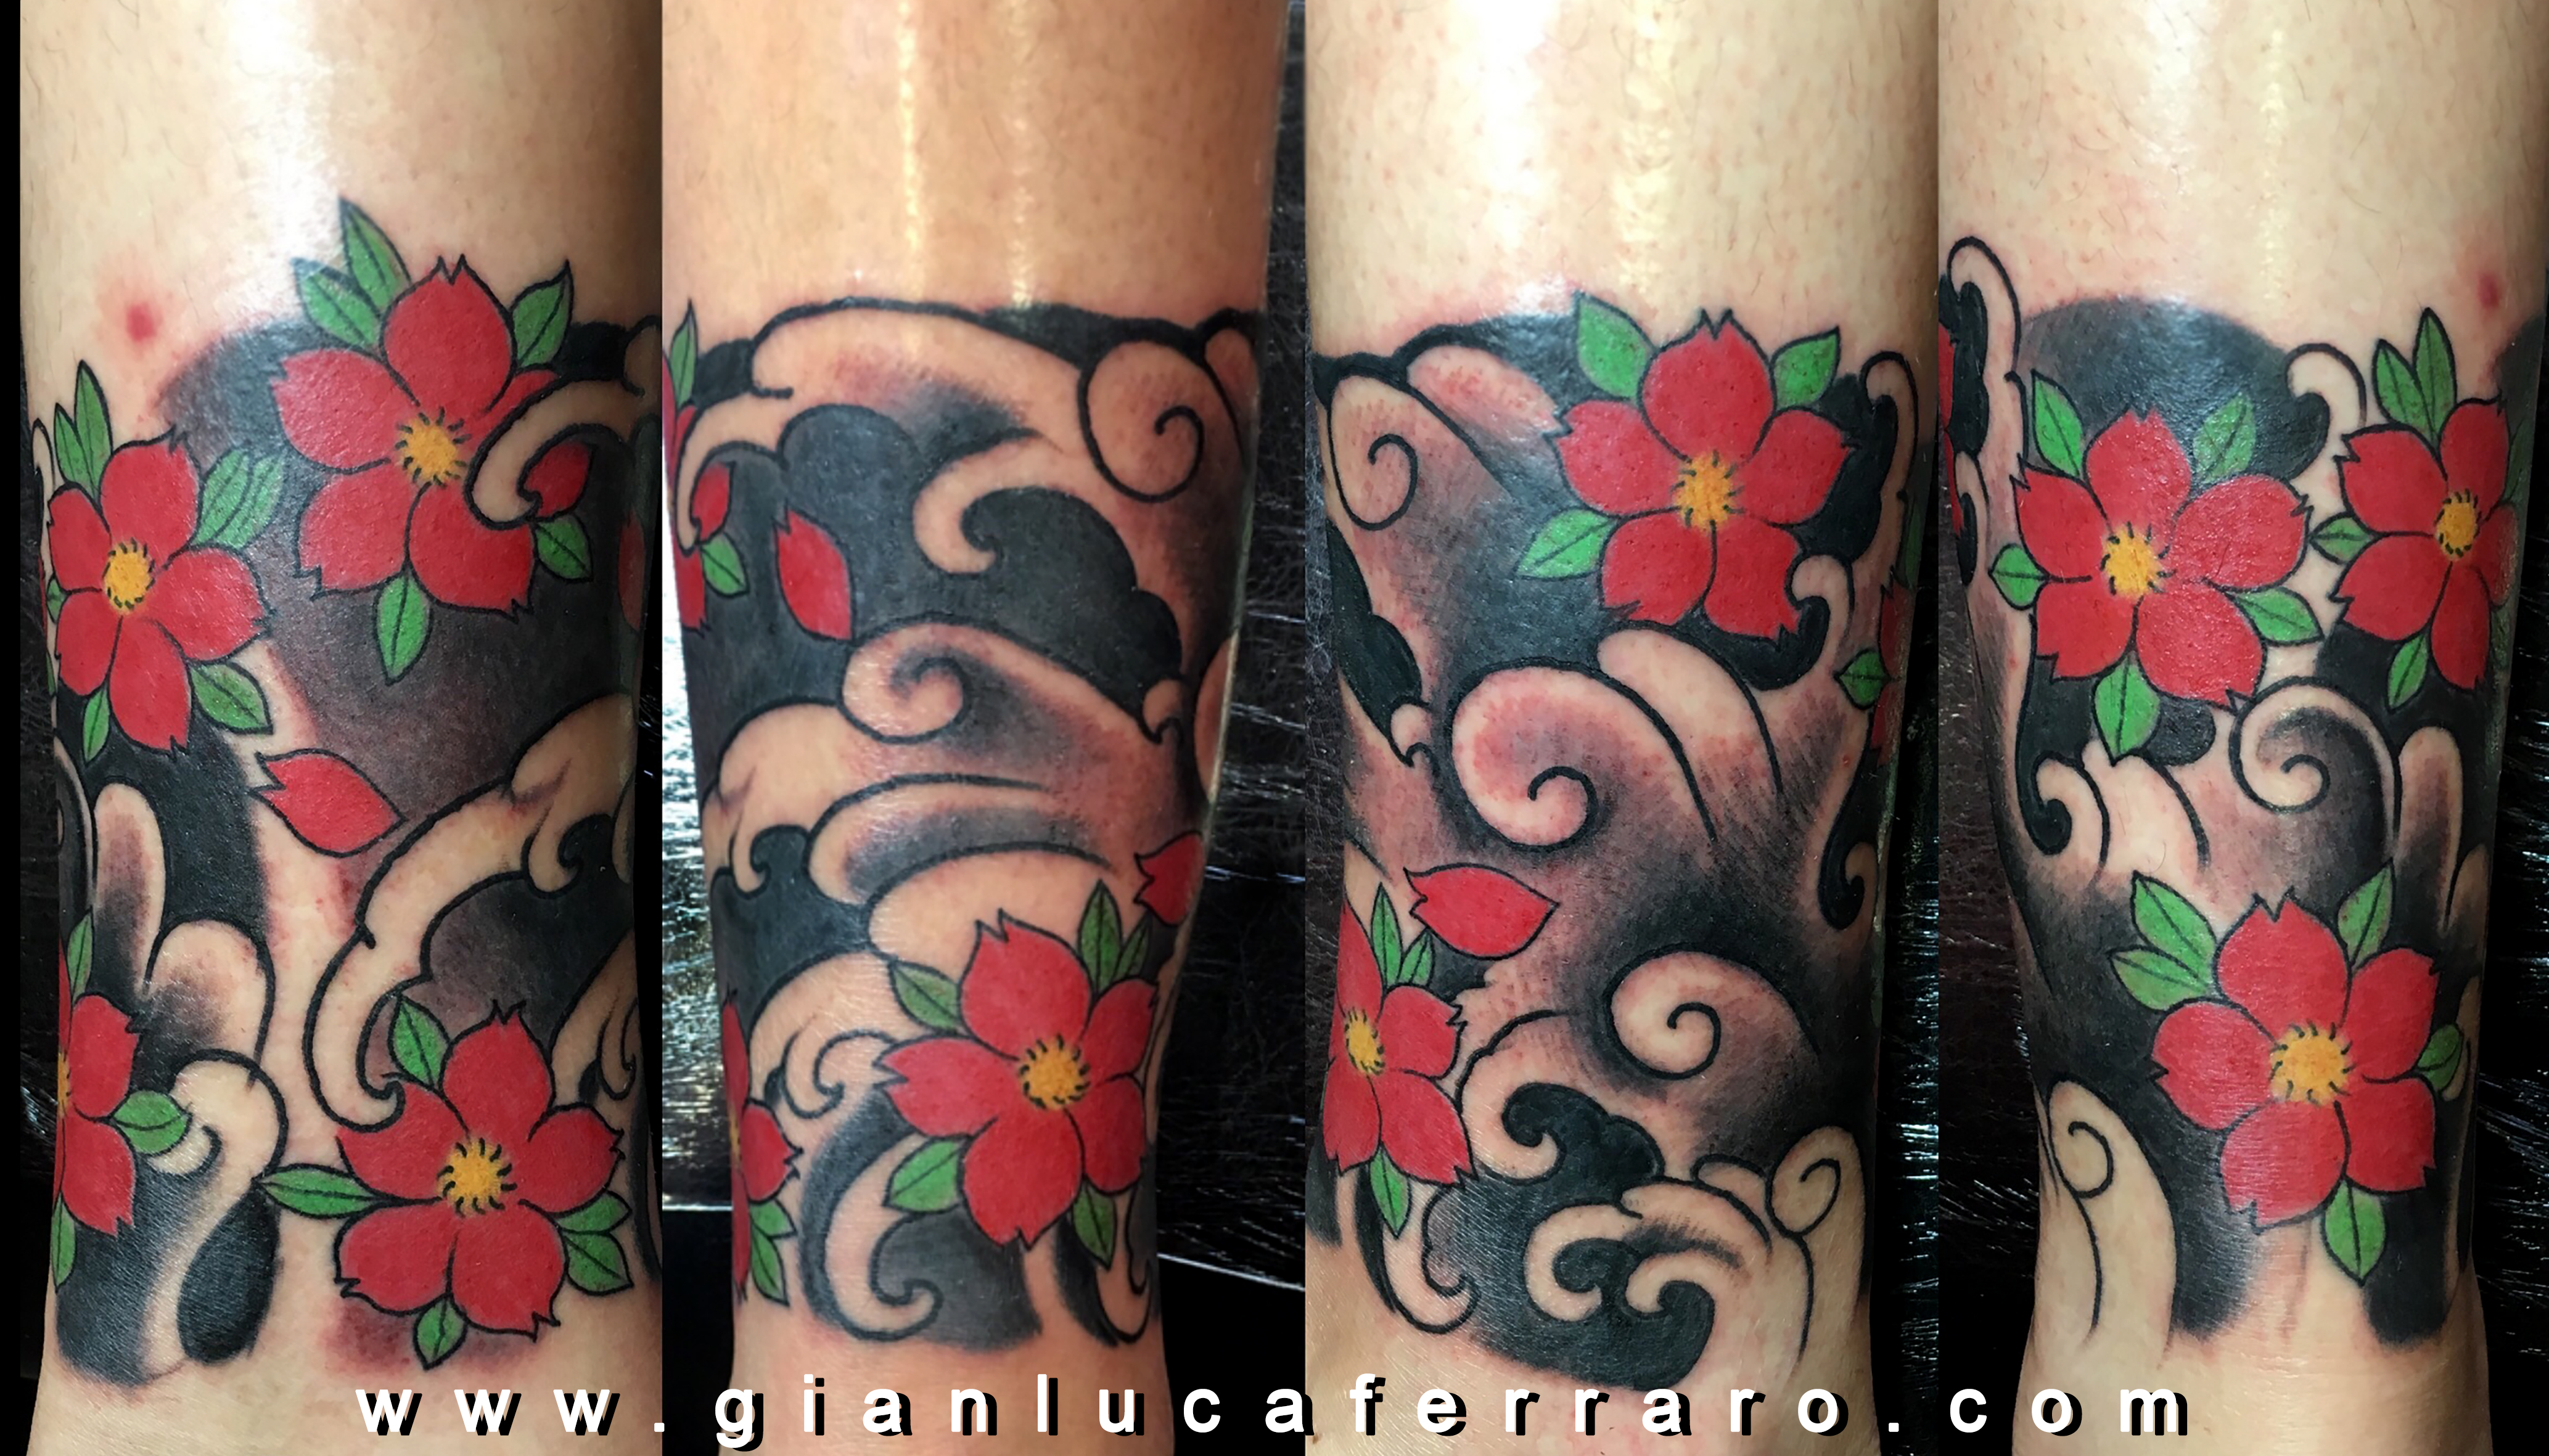 japan_gianluca_ferraro_tattoo_artist_black_and_grey_realistic_napoli_italia_fiori